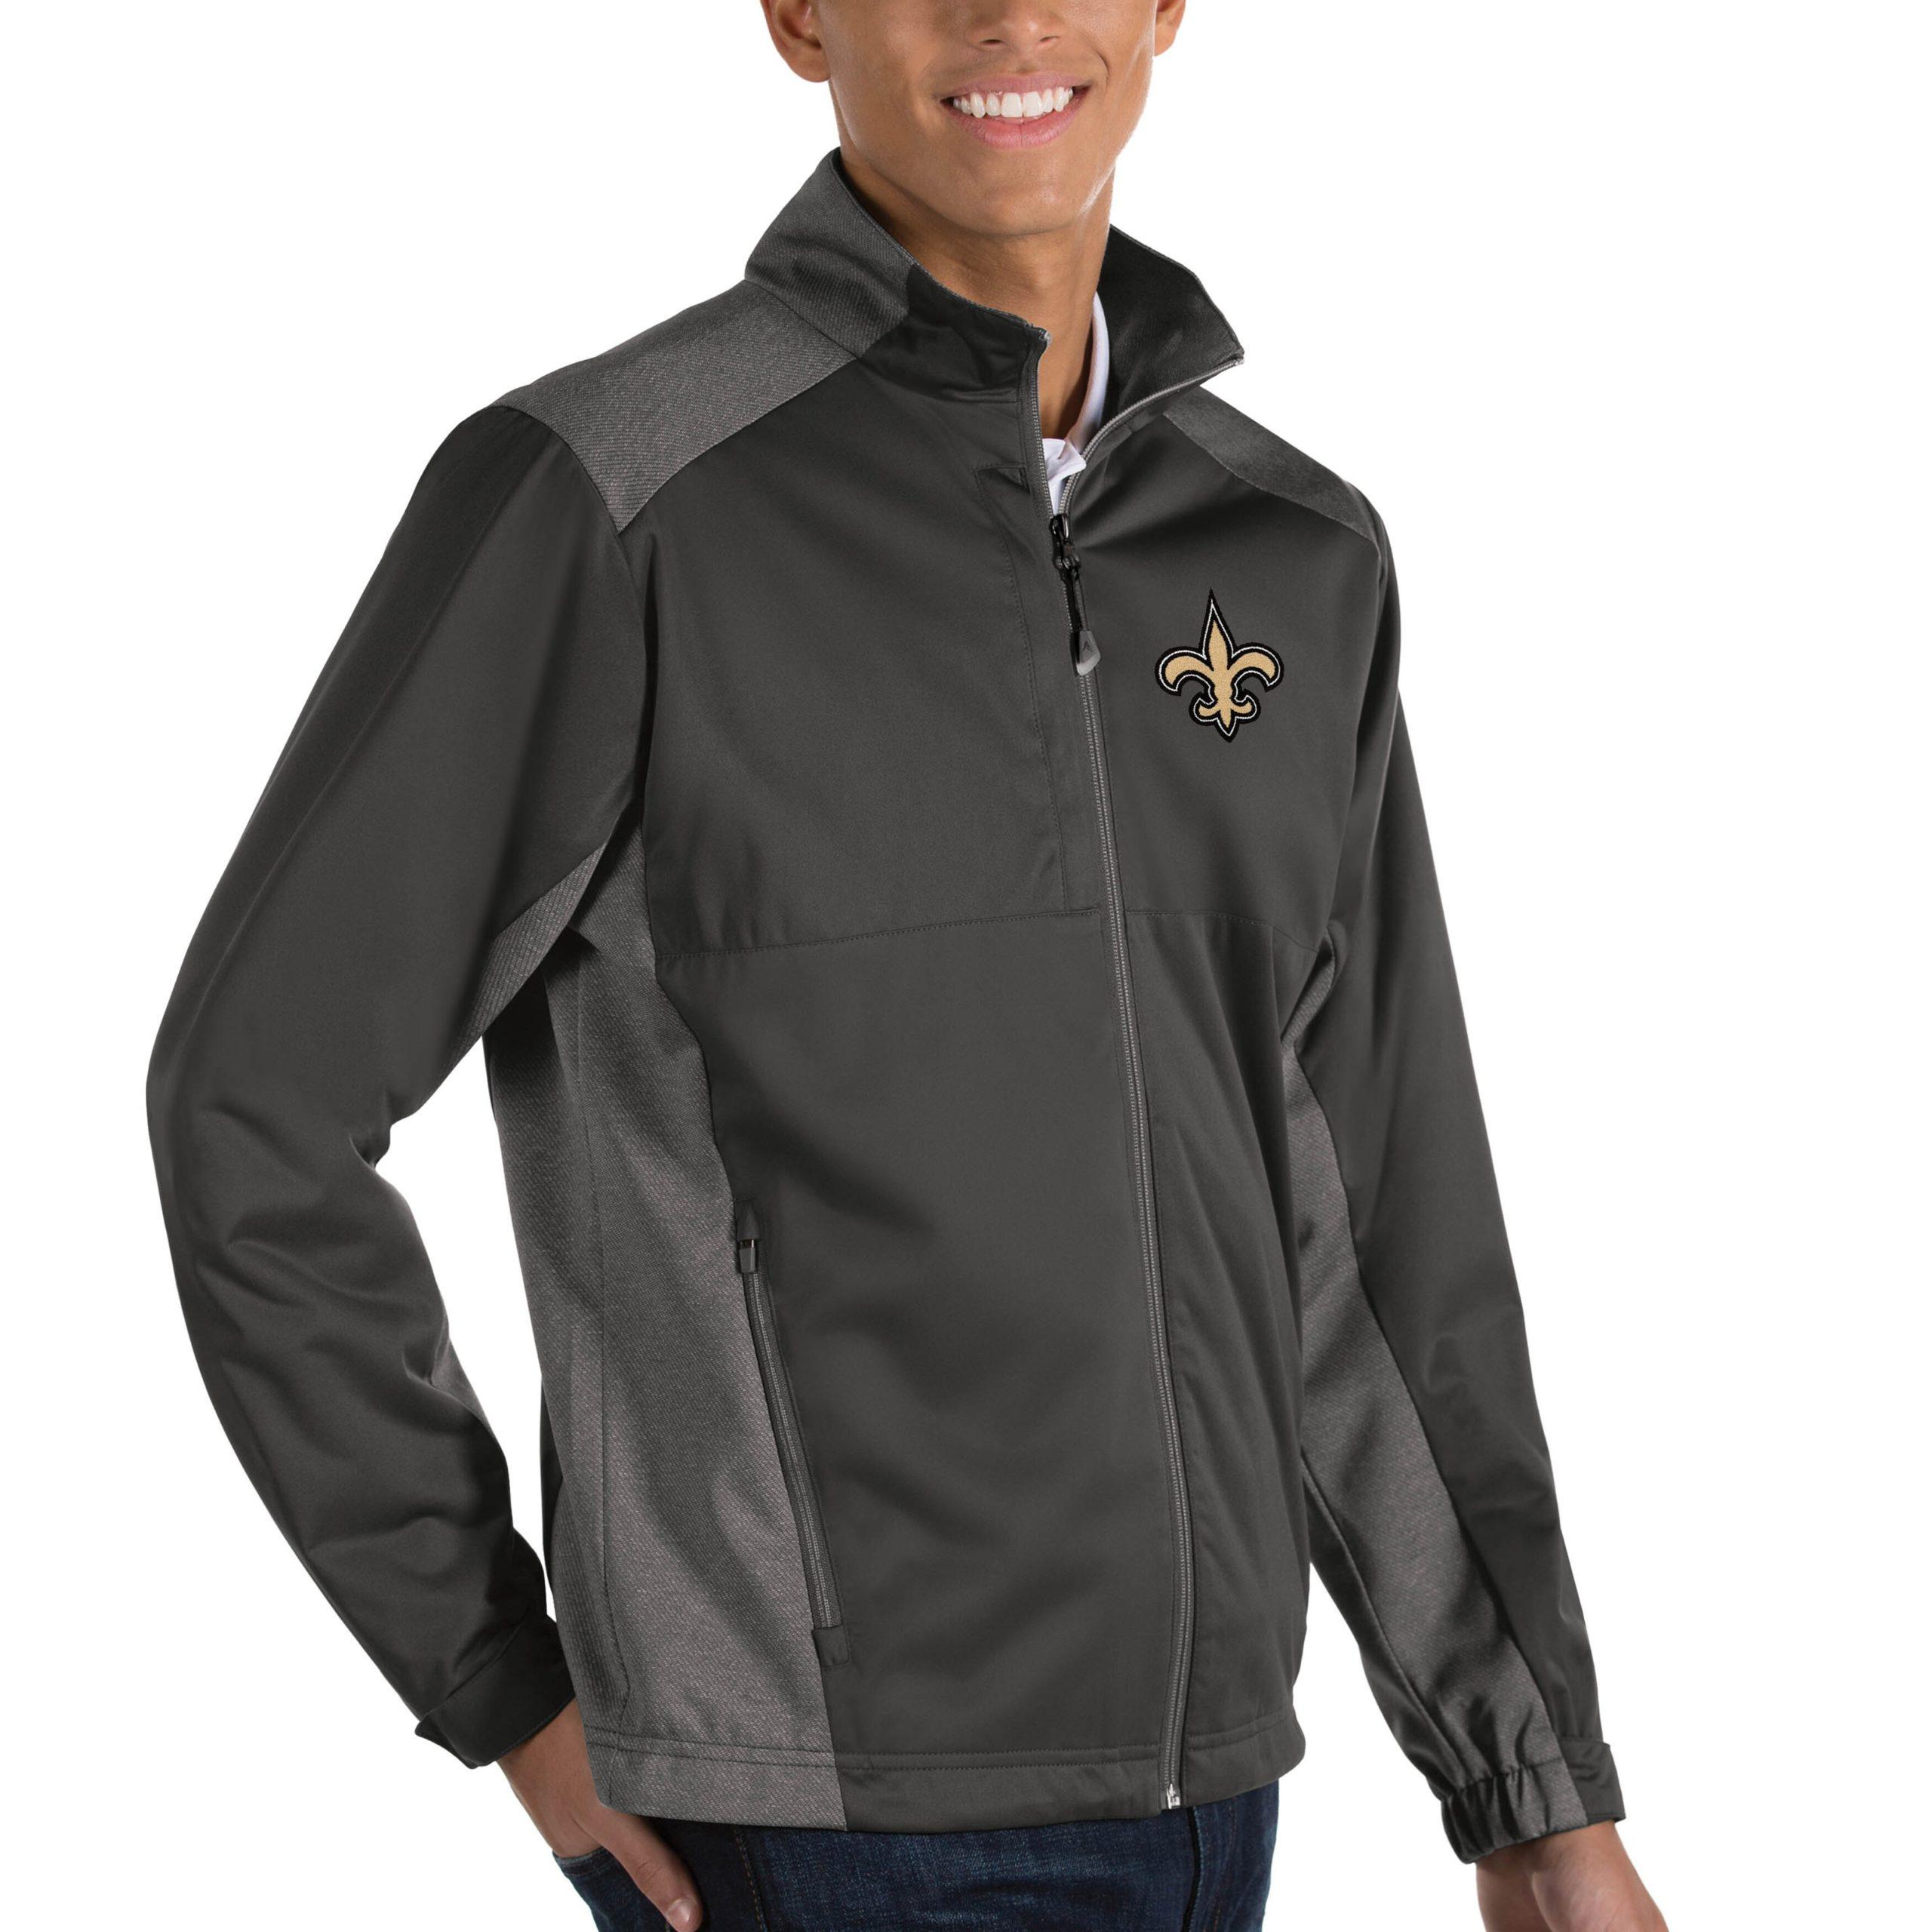 New Orleans Saints Antigua Revolve Big & Tall Full-Zip Jacket - Heather Charcoal